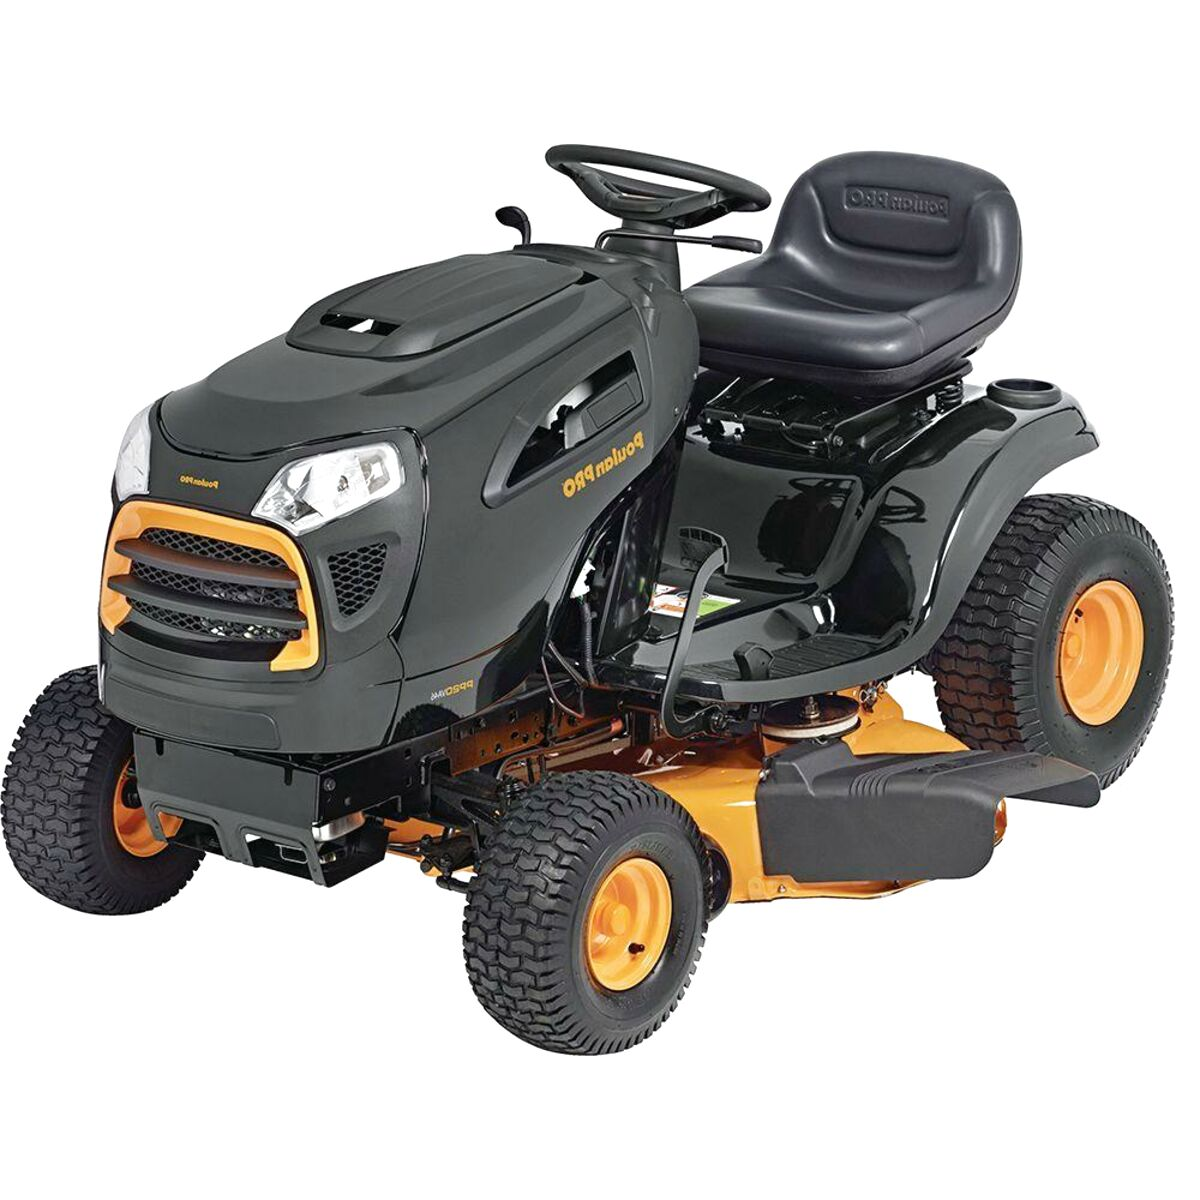 poulan pro riding mower for sale